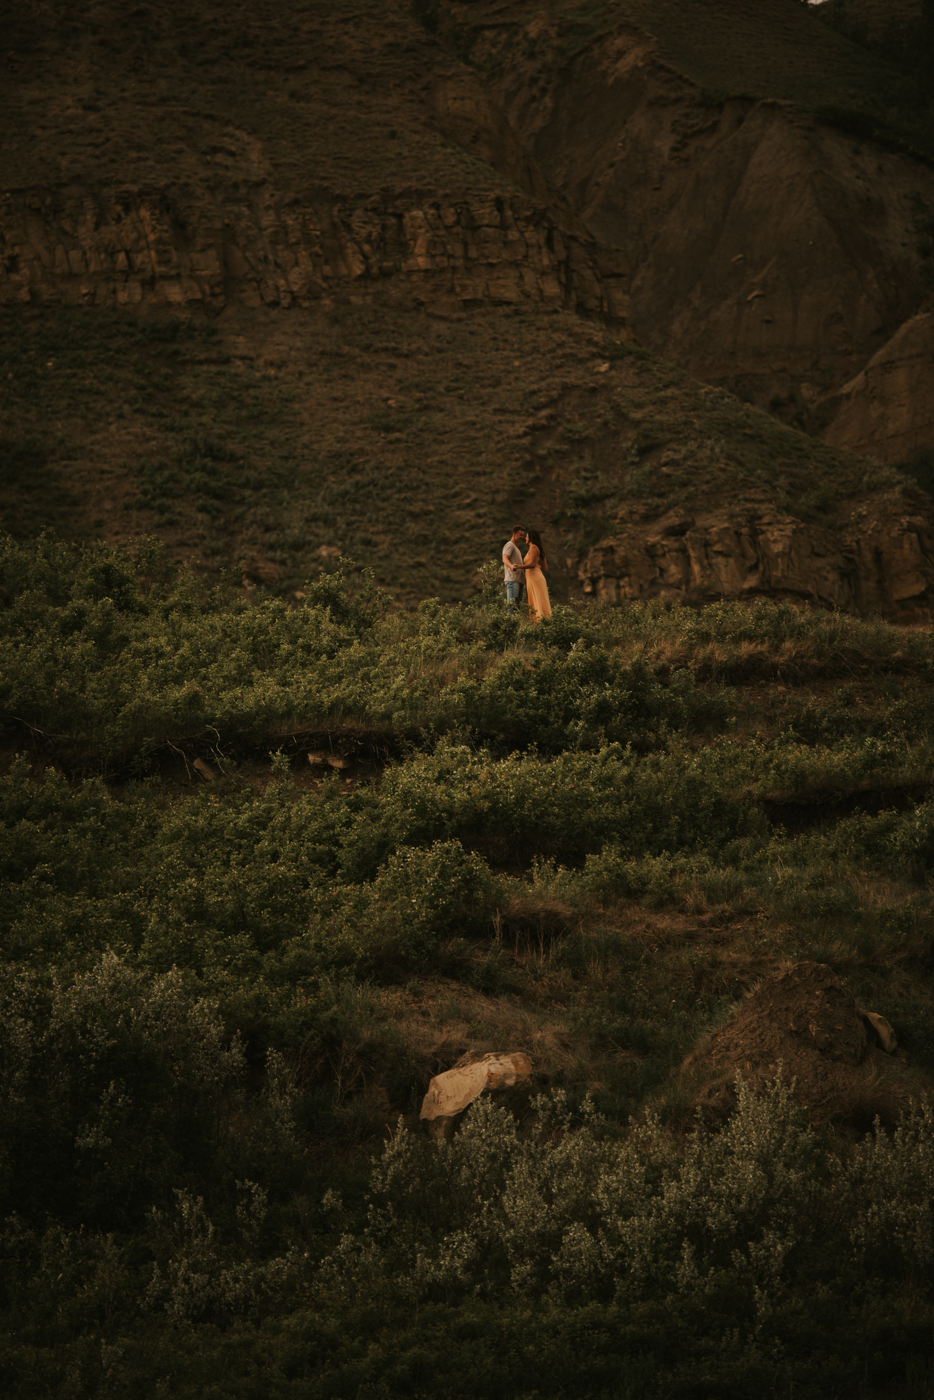 tyraephotography_photographer_wedding_elopement_engagement_photography-6287.jpg